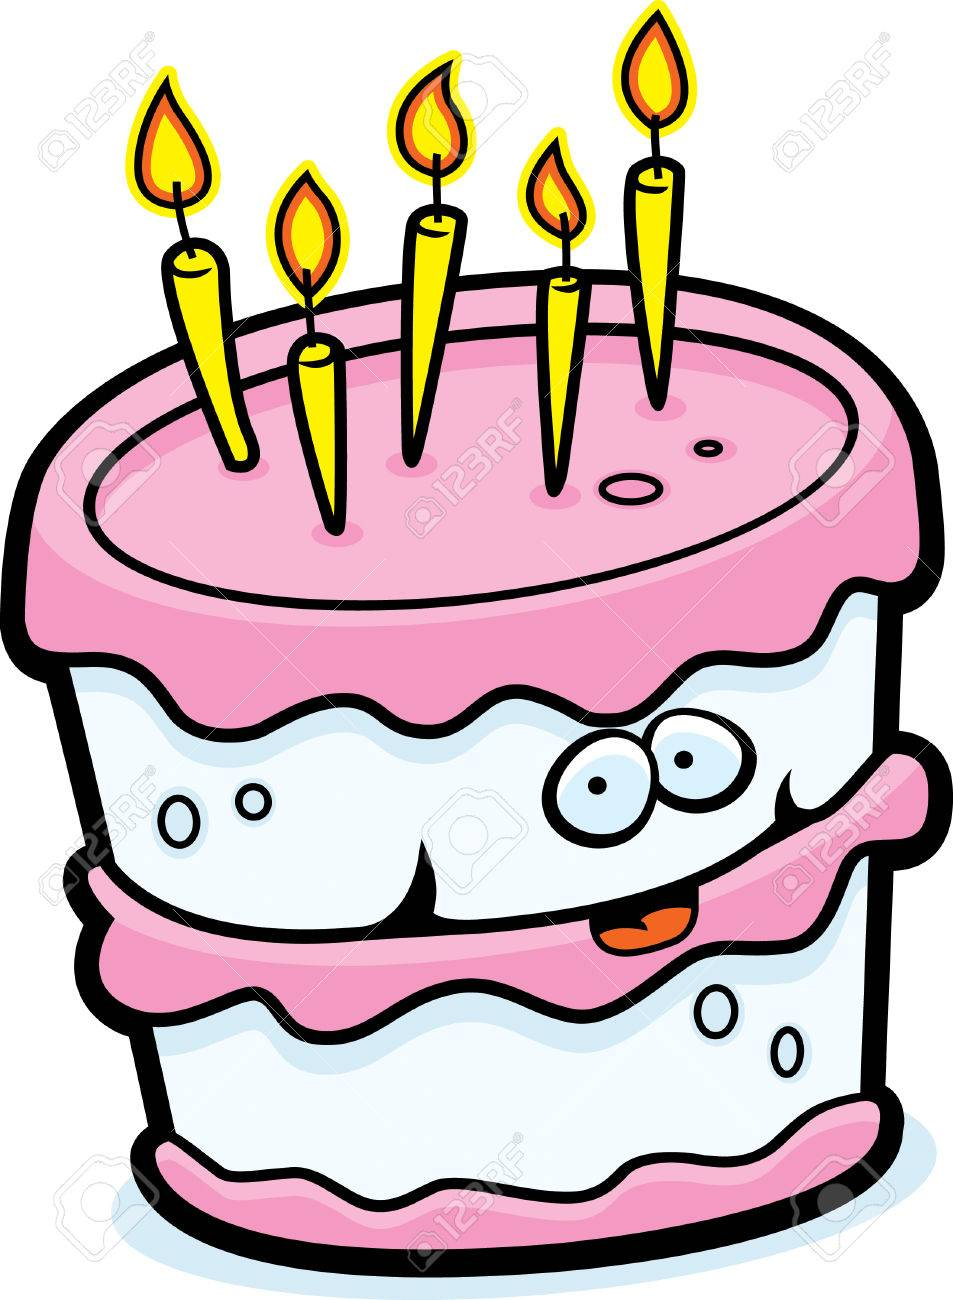 A Cartoon Birthday Cake Happy And Smiling Stock Vector